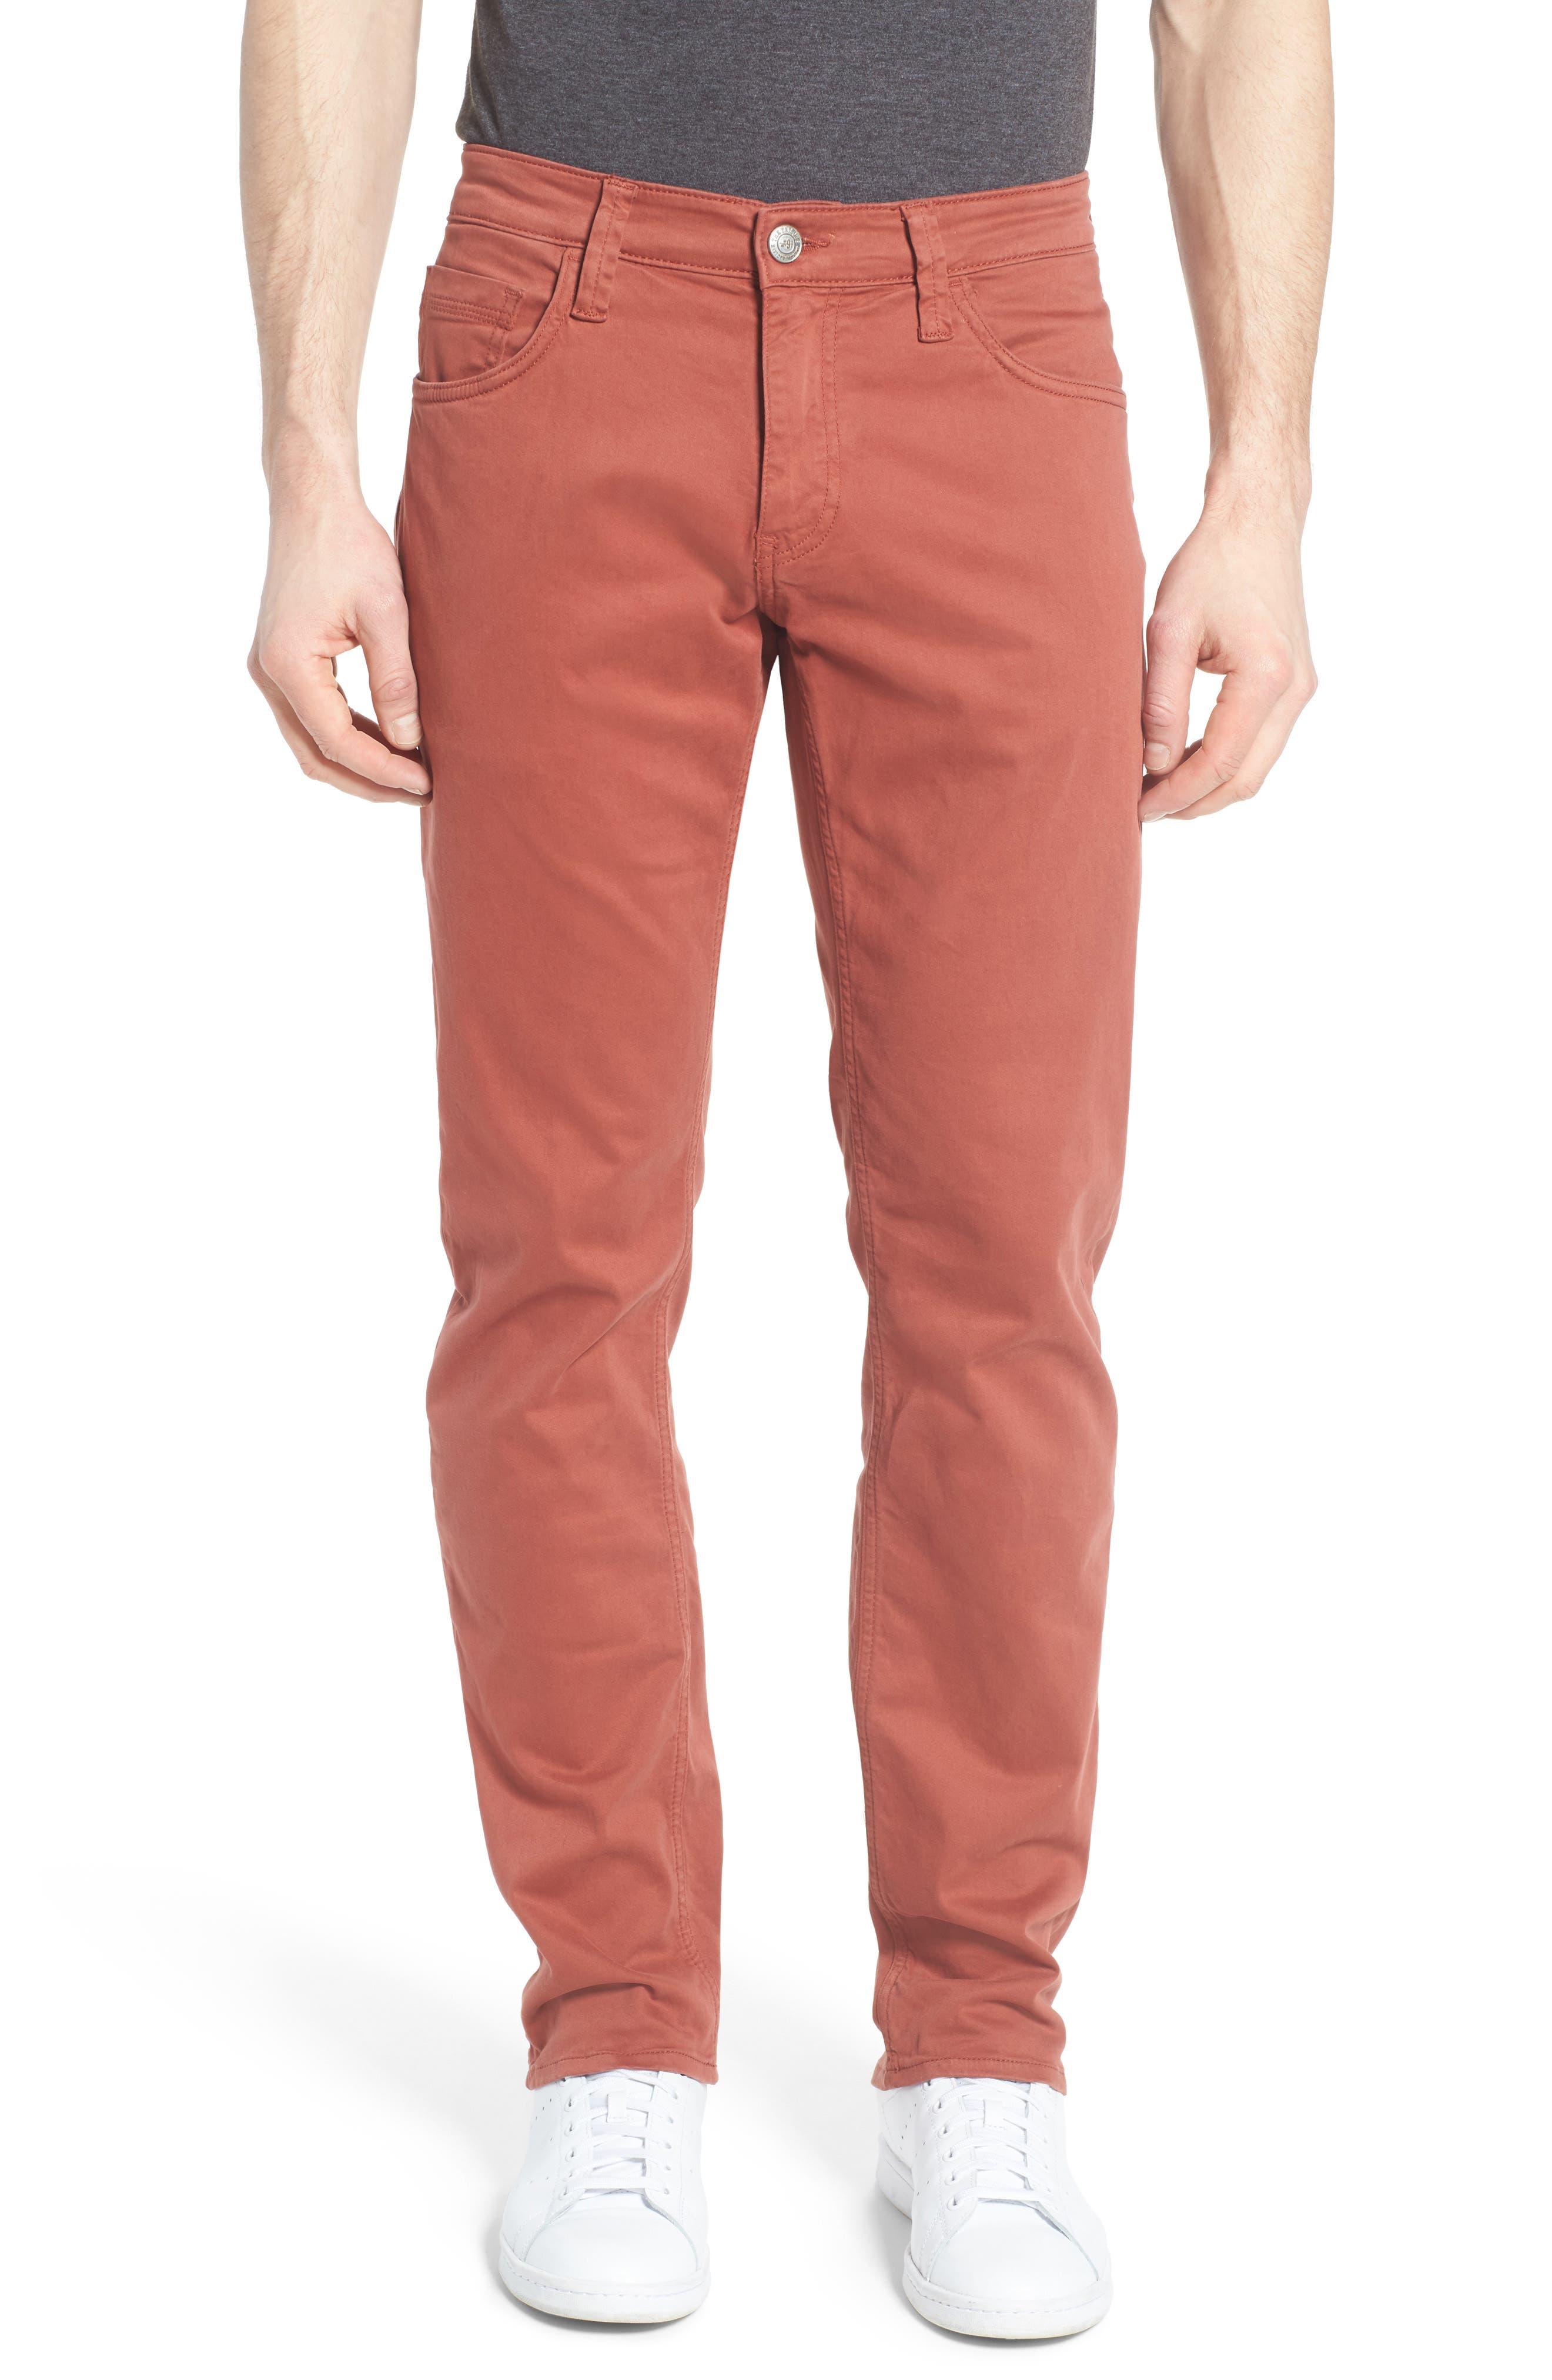 Main Image - Mavi Jeans Zach Straight Leg Jeans (Brick Red Twill)